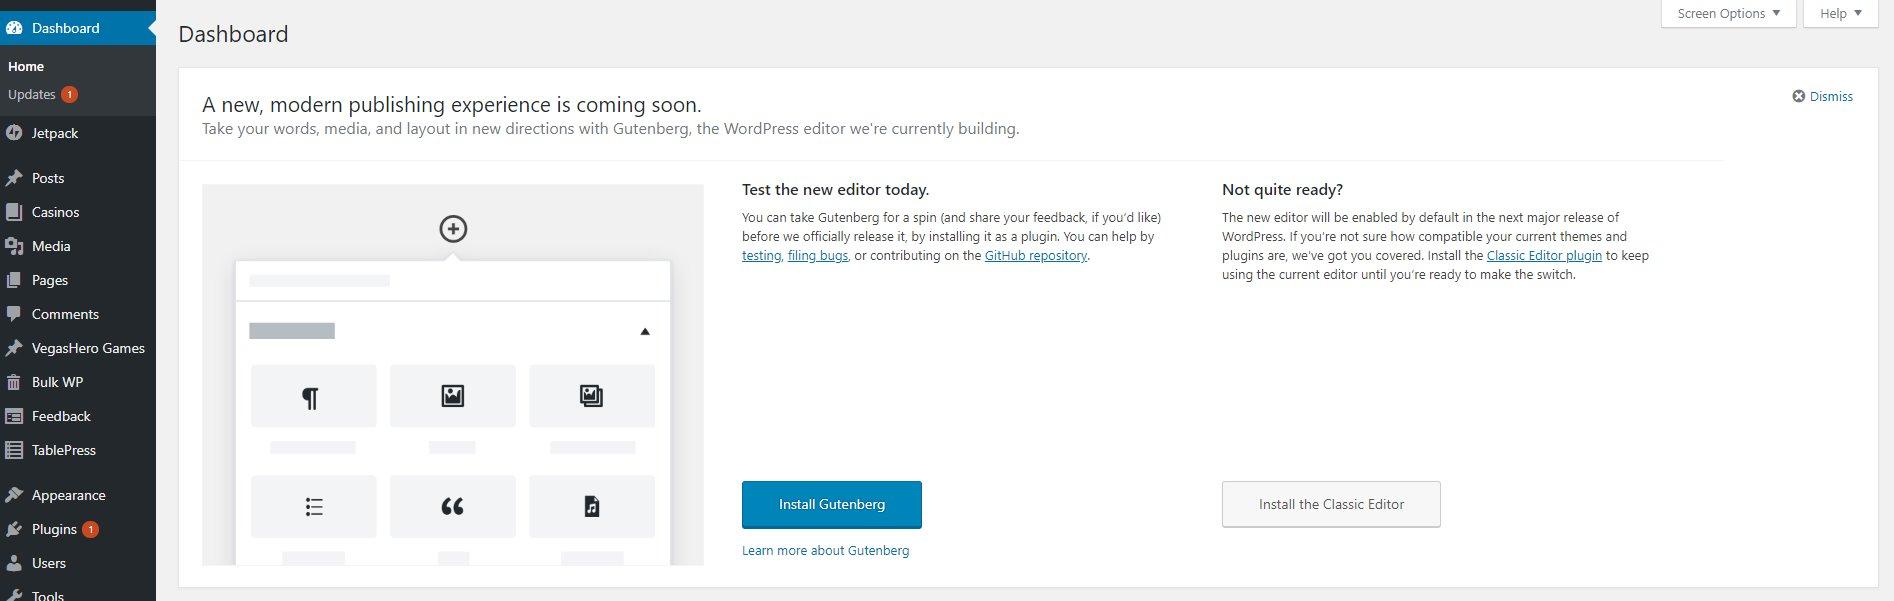 gutenberg-wp-5.0-update-notice